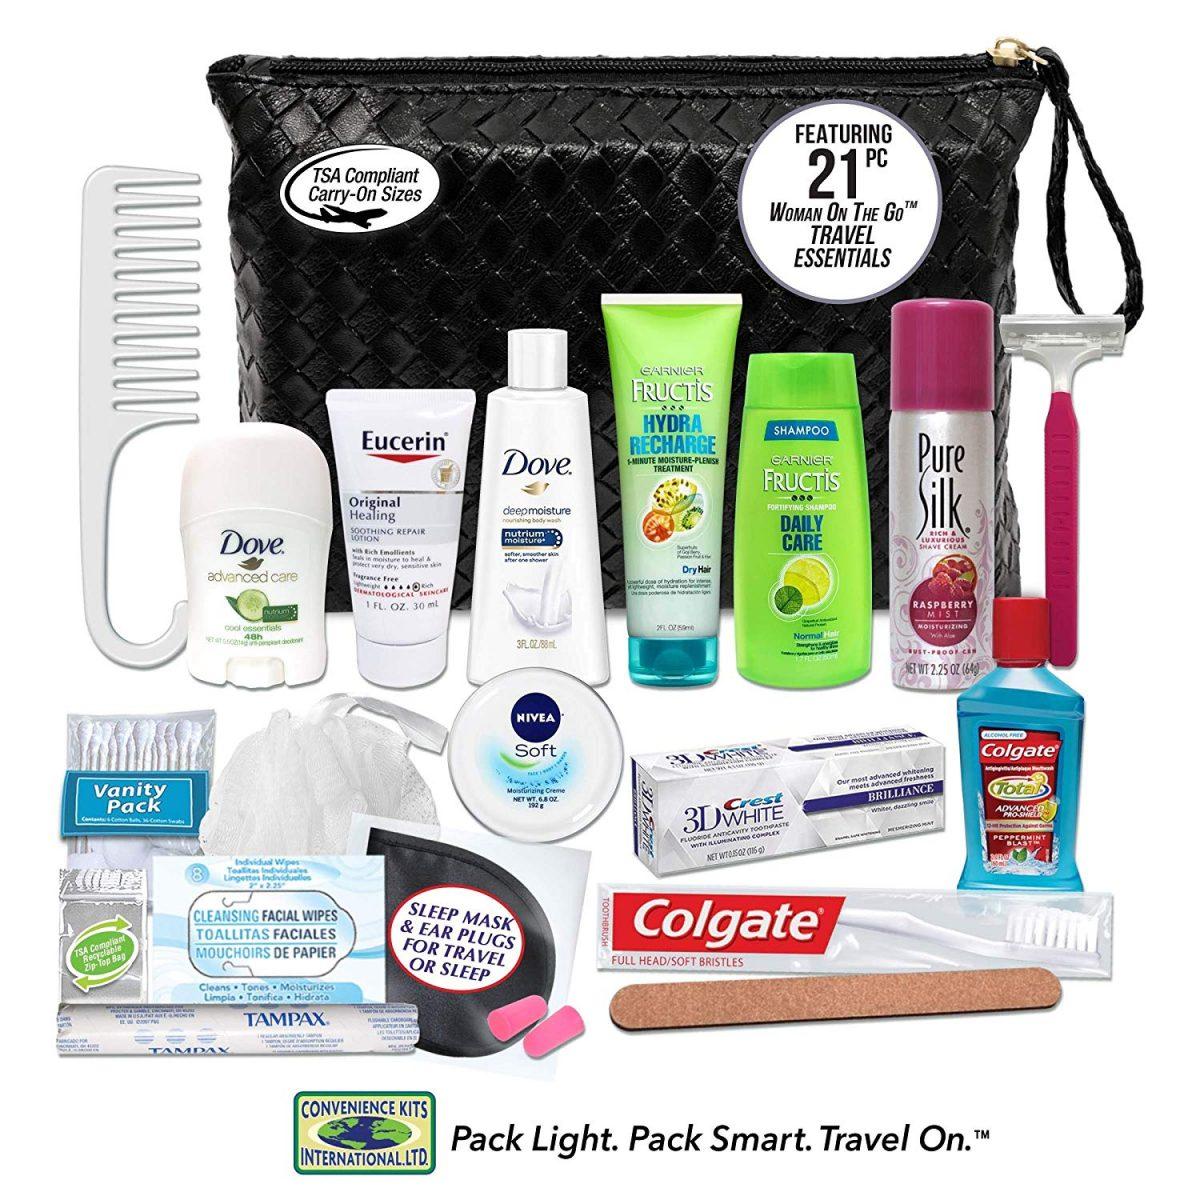 Convenience Kit